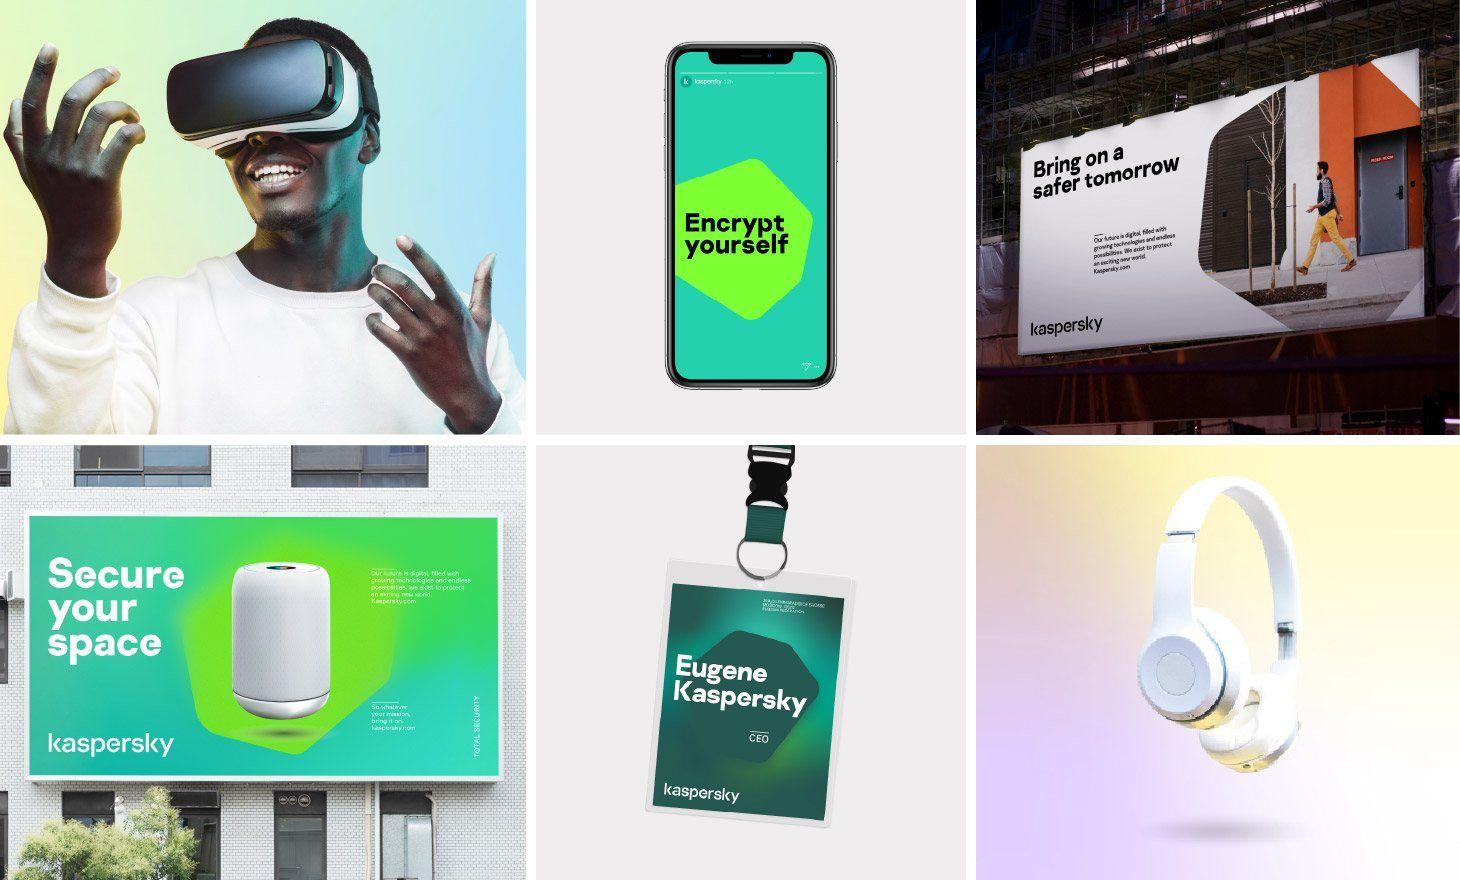 Kaspersky's new brand